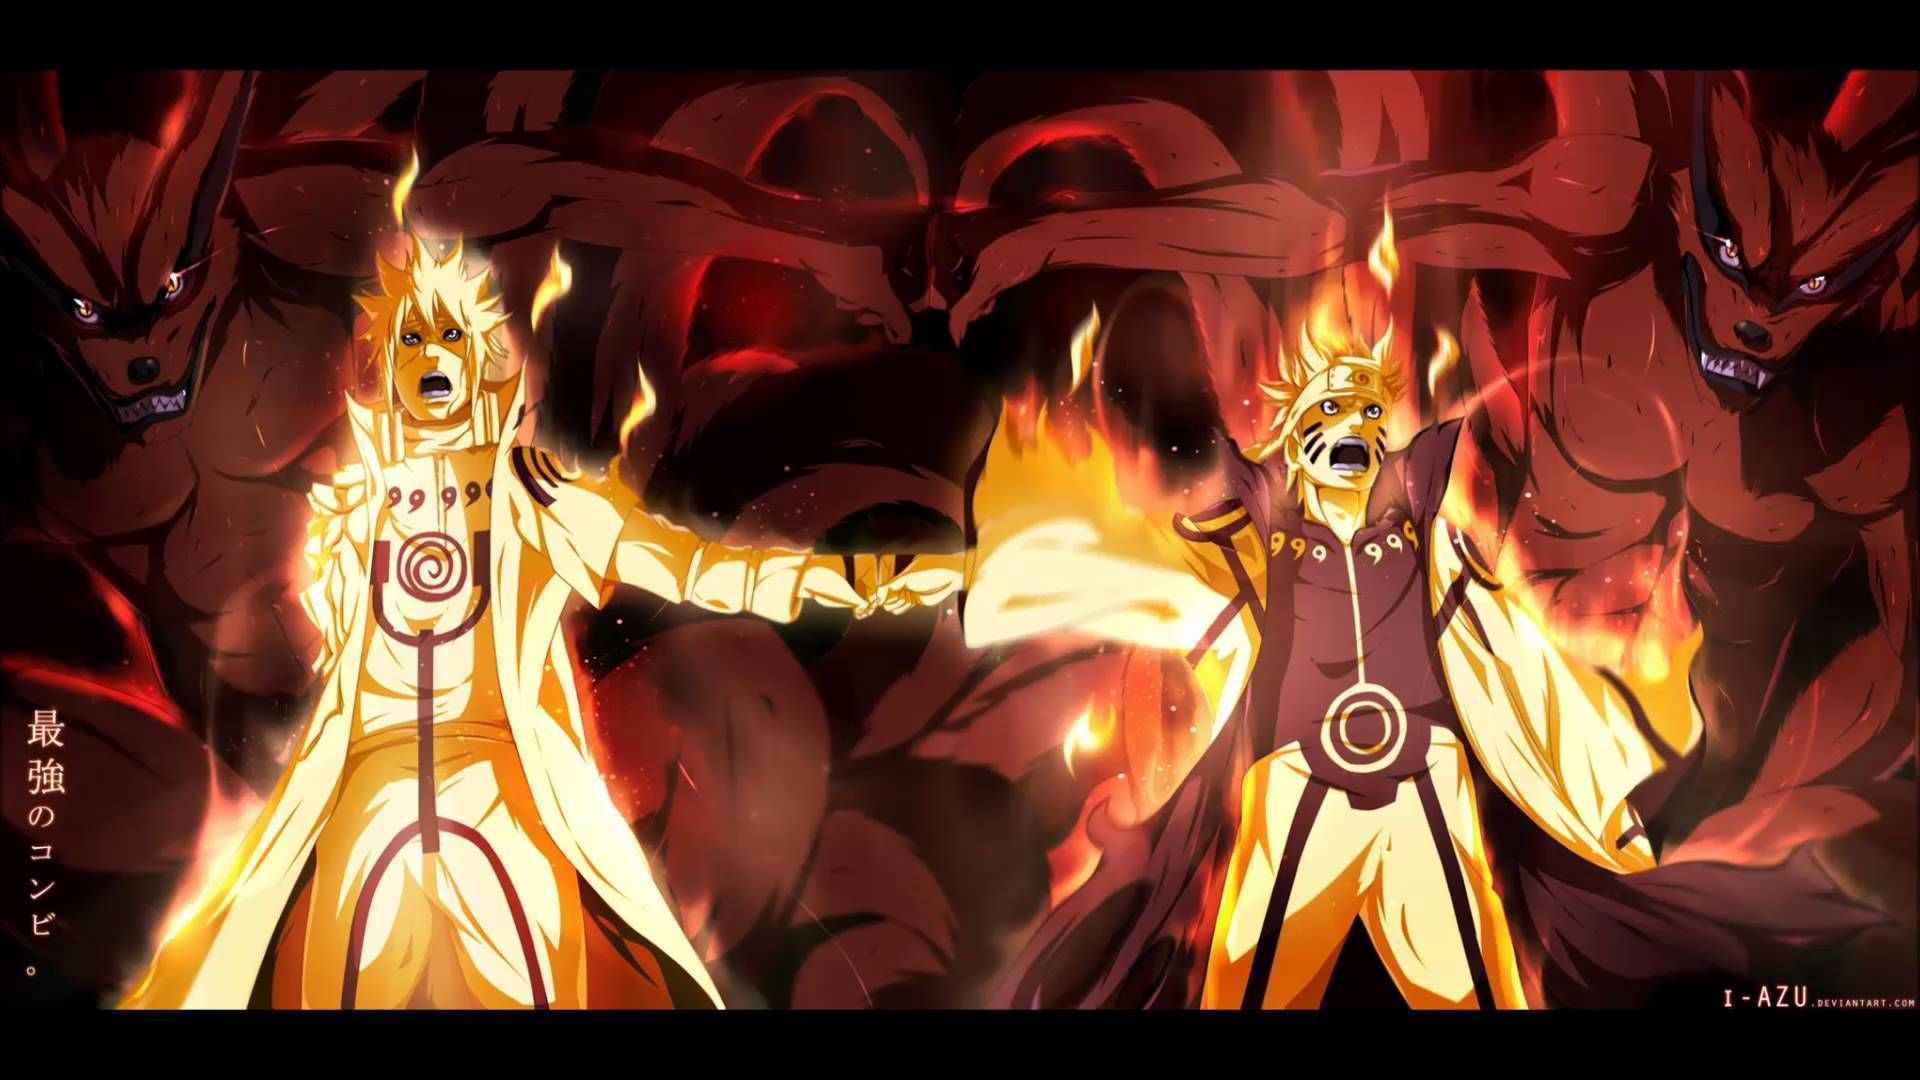 Download Wallpaper Naruto High Resolution - f0dd5b4e60d355cb8bb1fcb80a99291d  Trends_51911.jpg